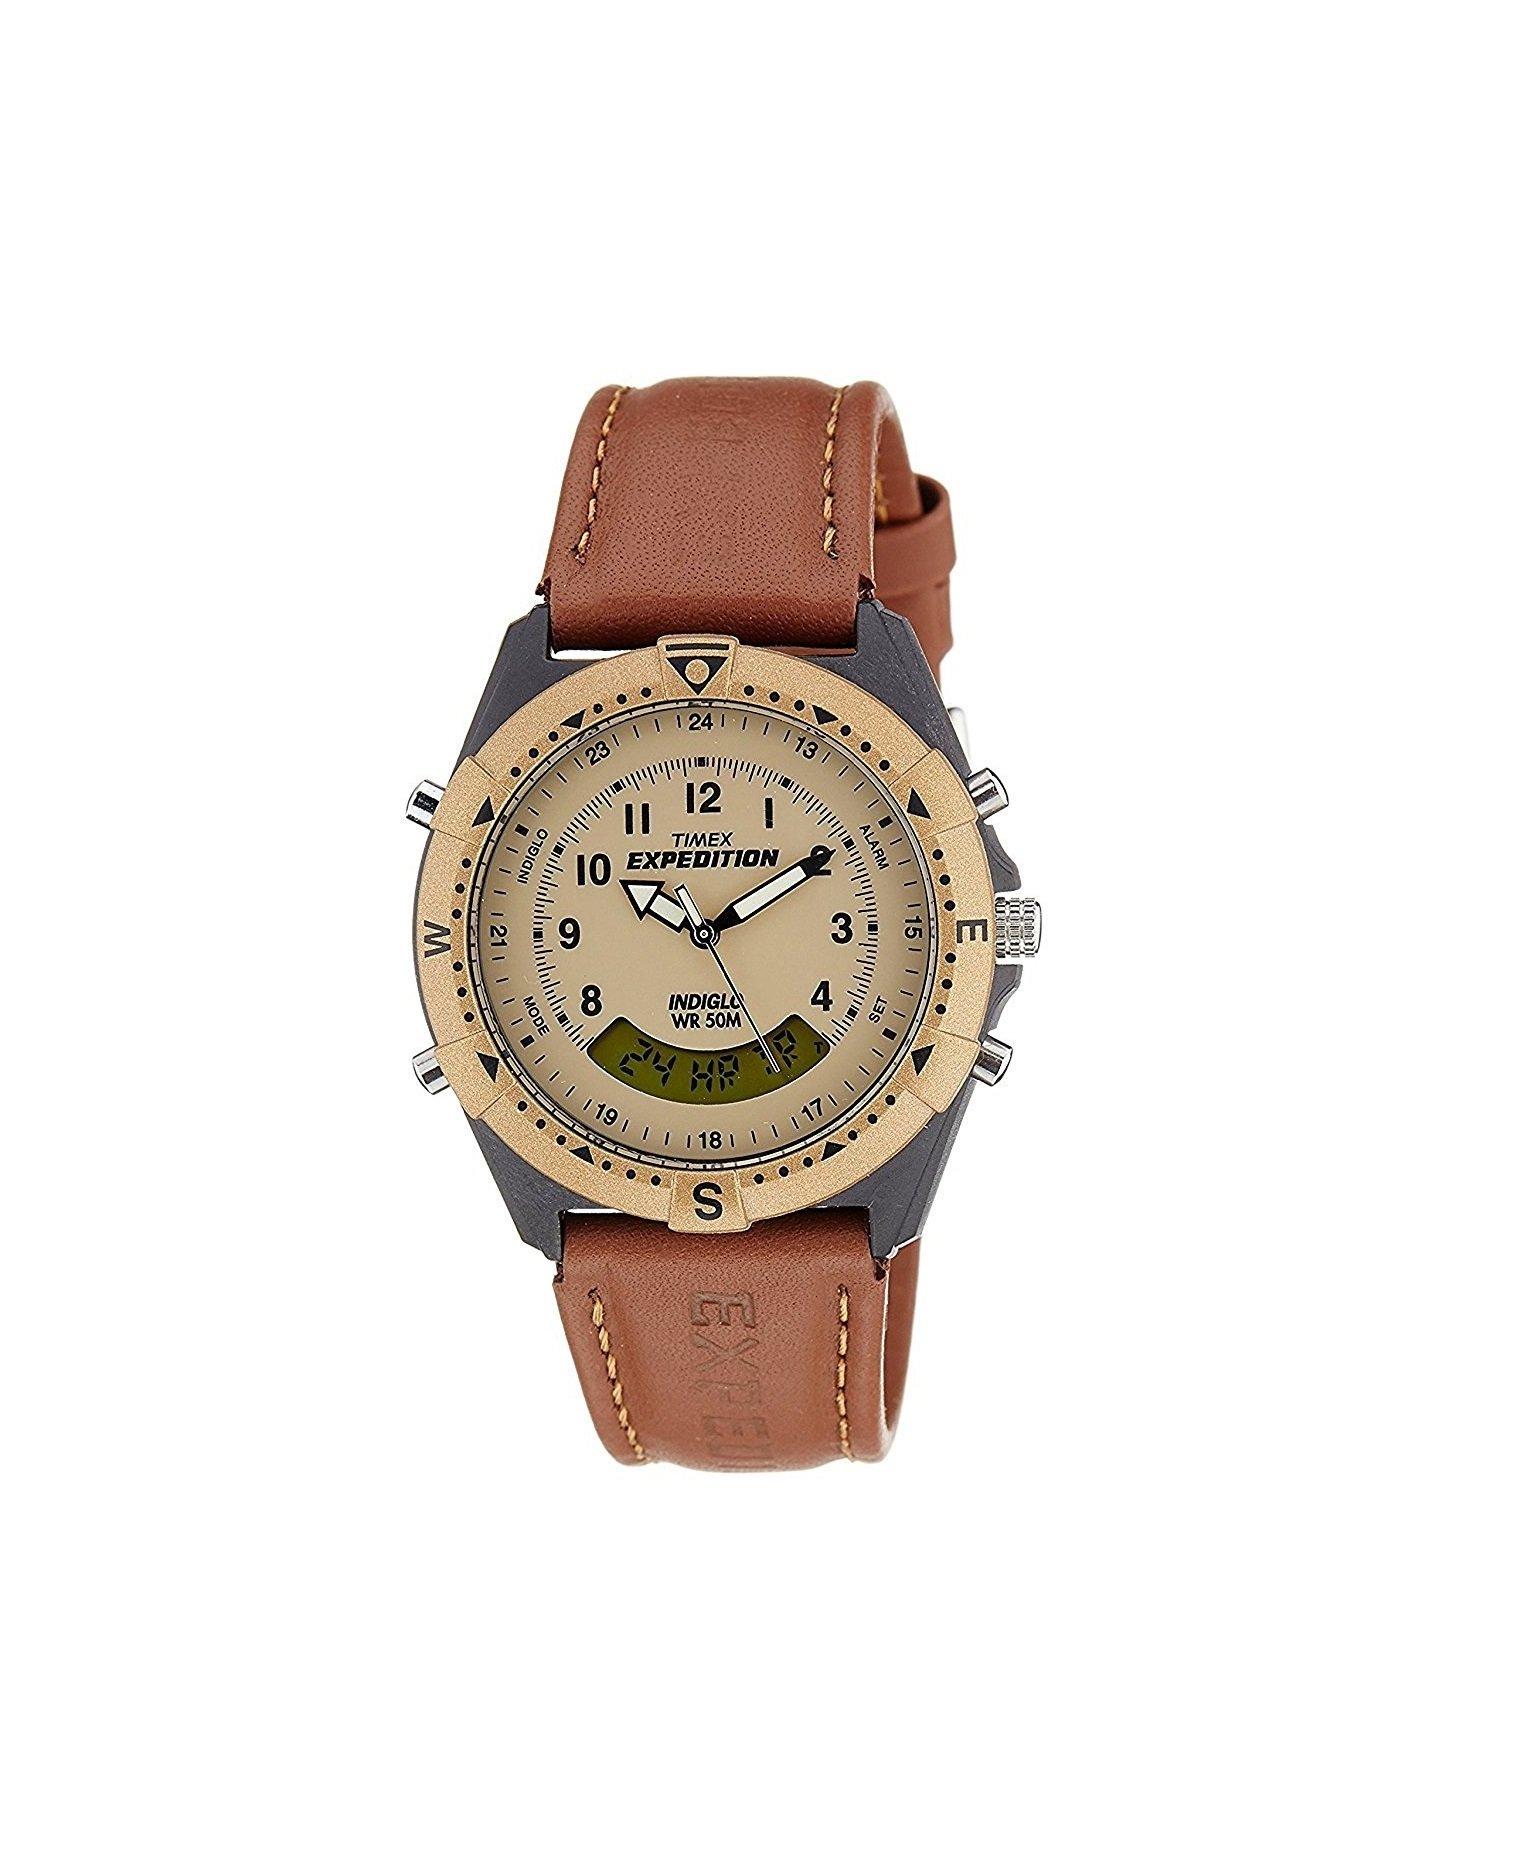 Timex Men's Expedition Analogdigital Beige Dial Watch